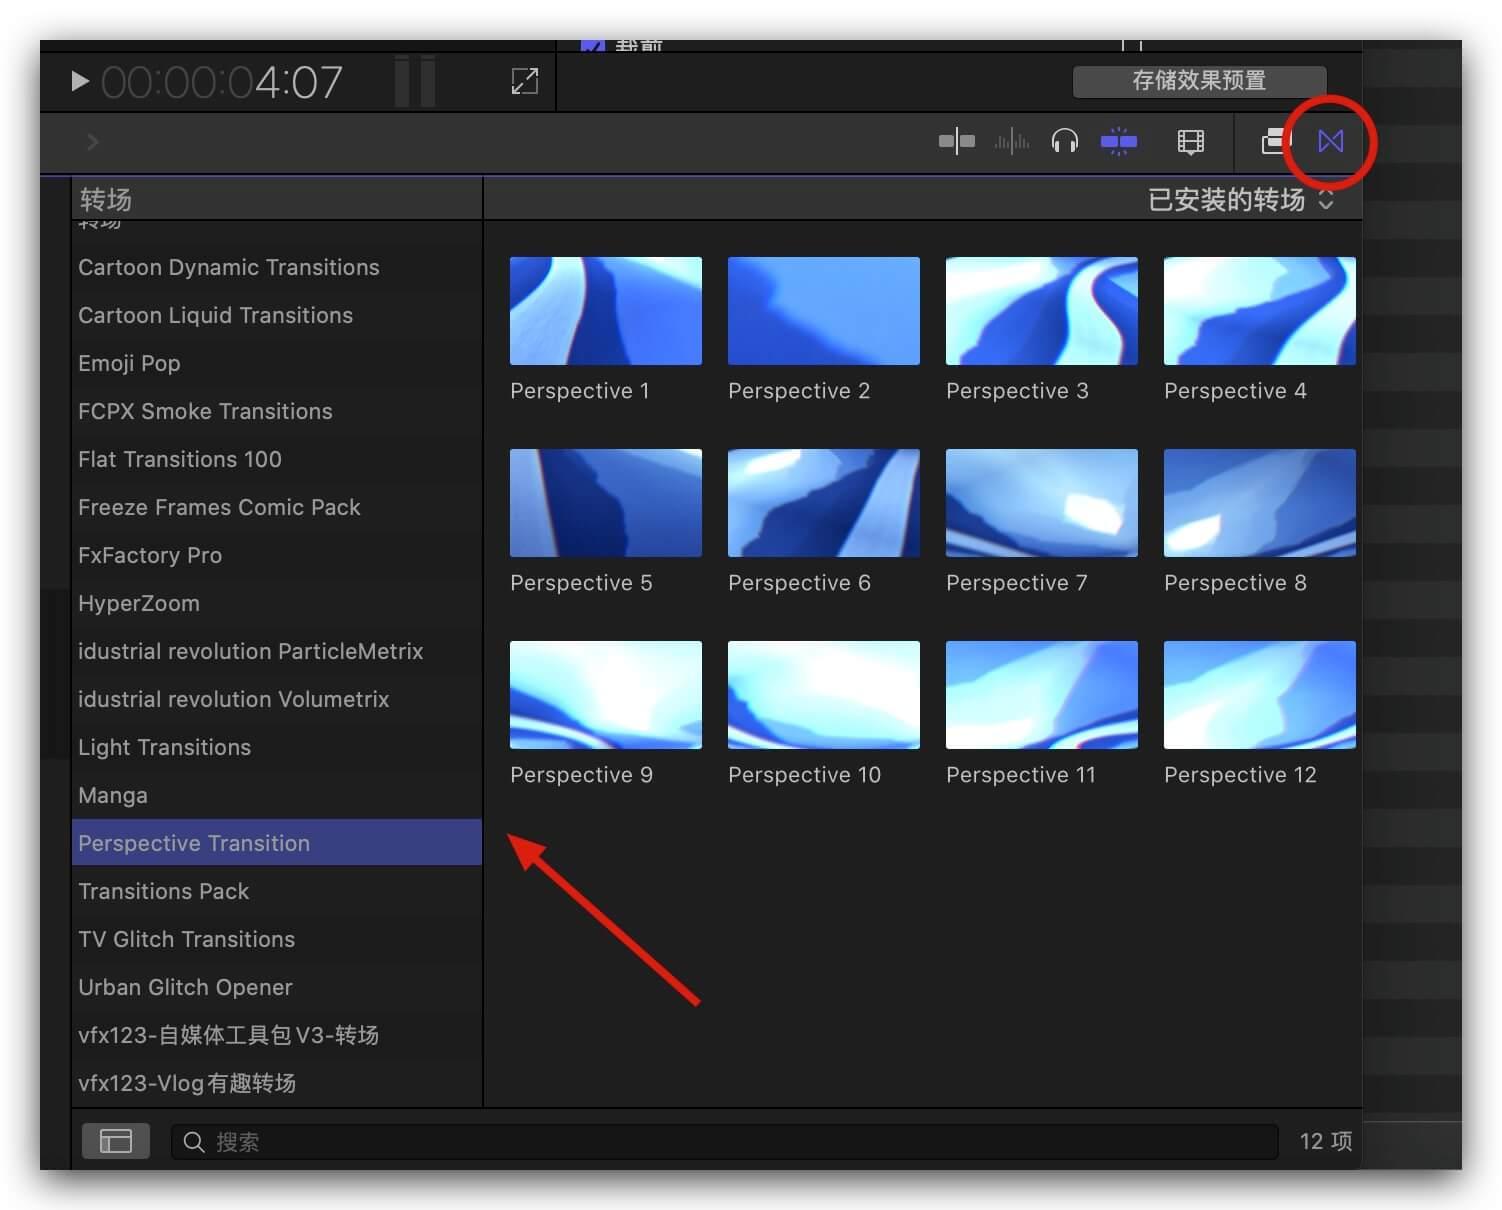 fcpx转场插件 12组镜头透视旋转效果过渡转场 Perspective Transition